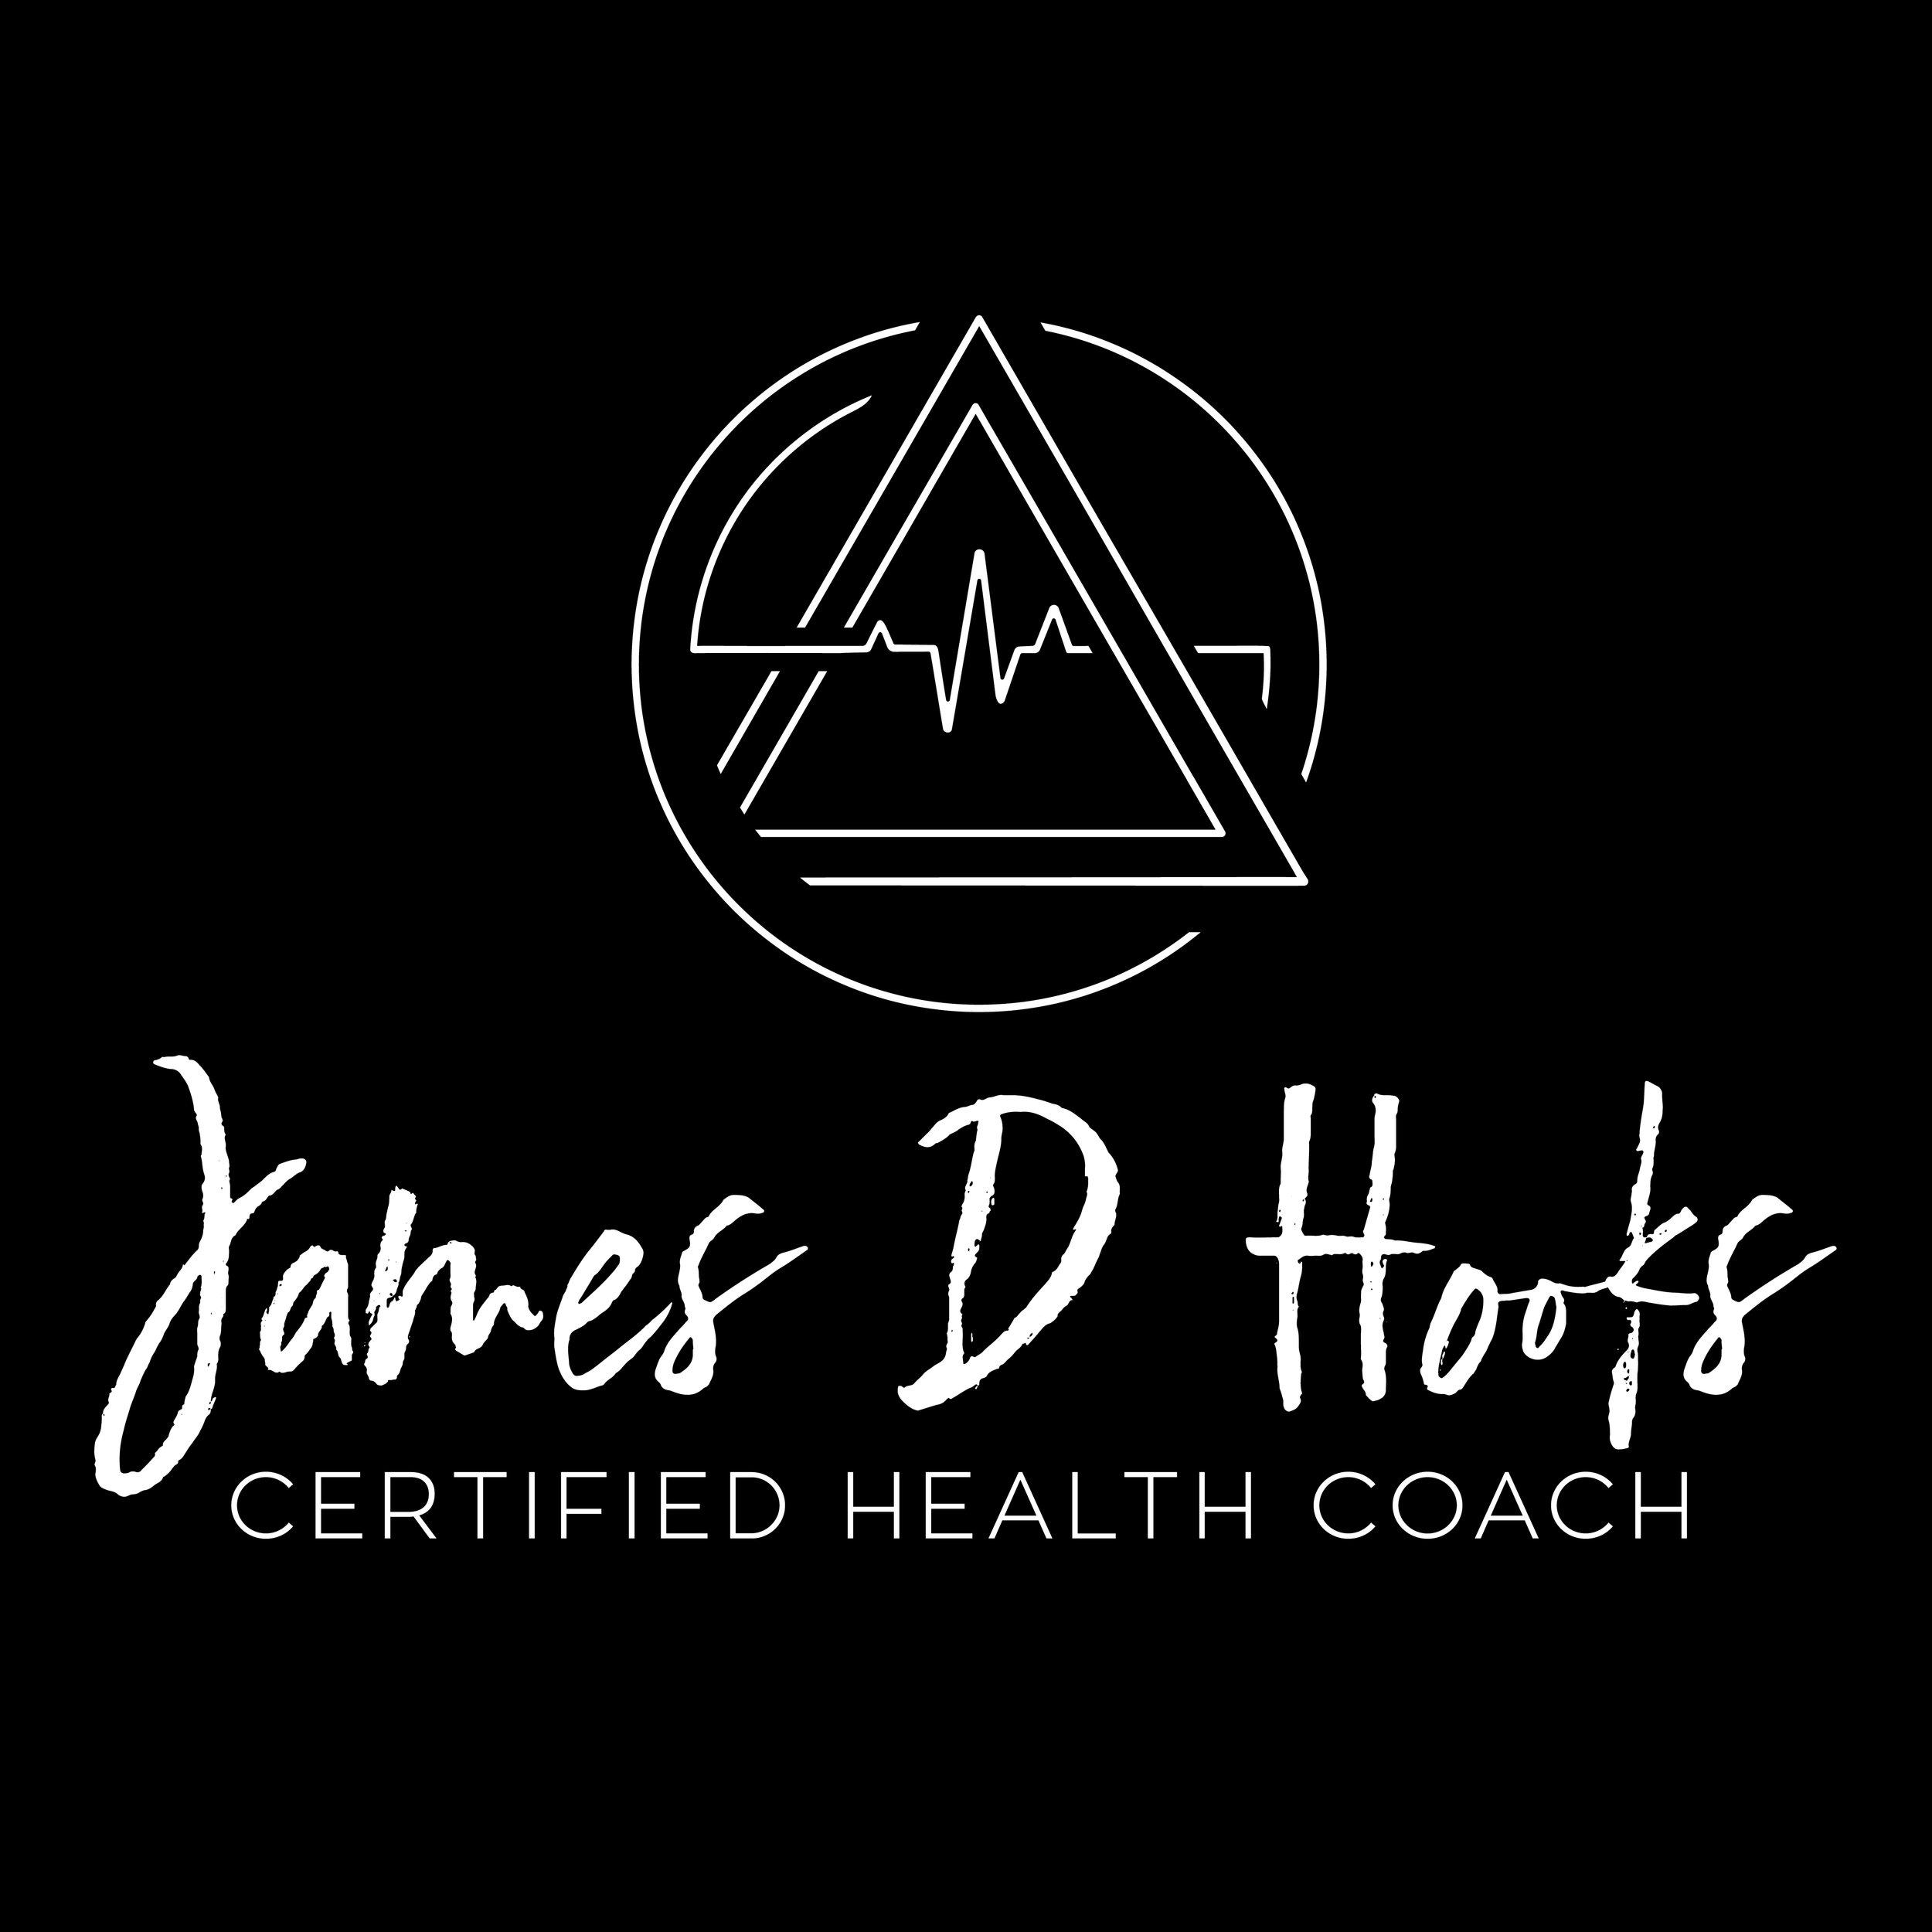 missyrobbsgdp_Logo_James_D_Hooks_Health_Coach.jpg